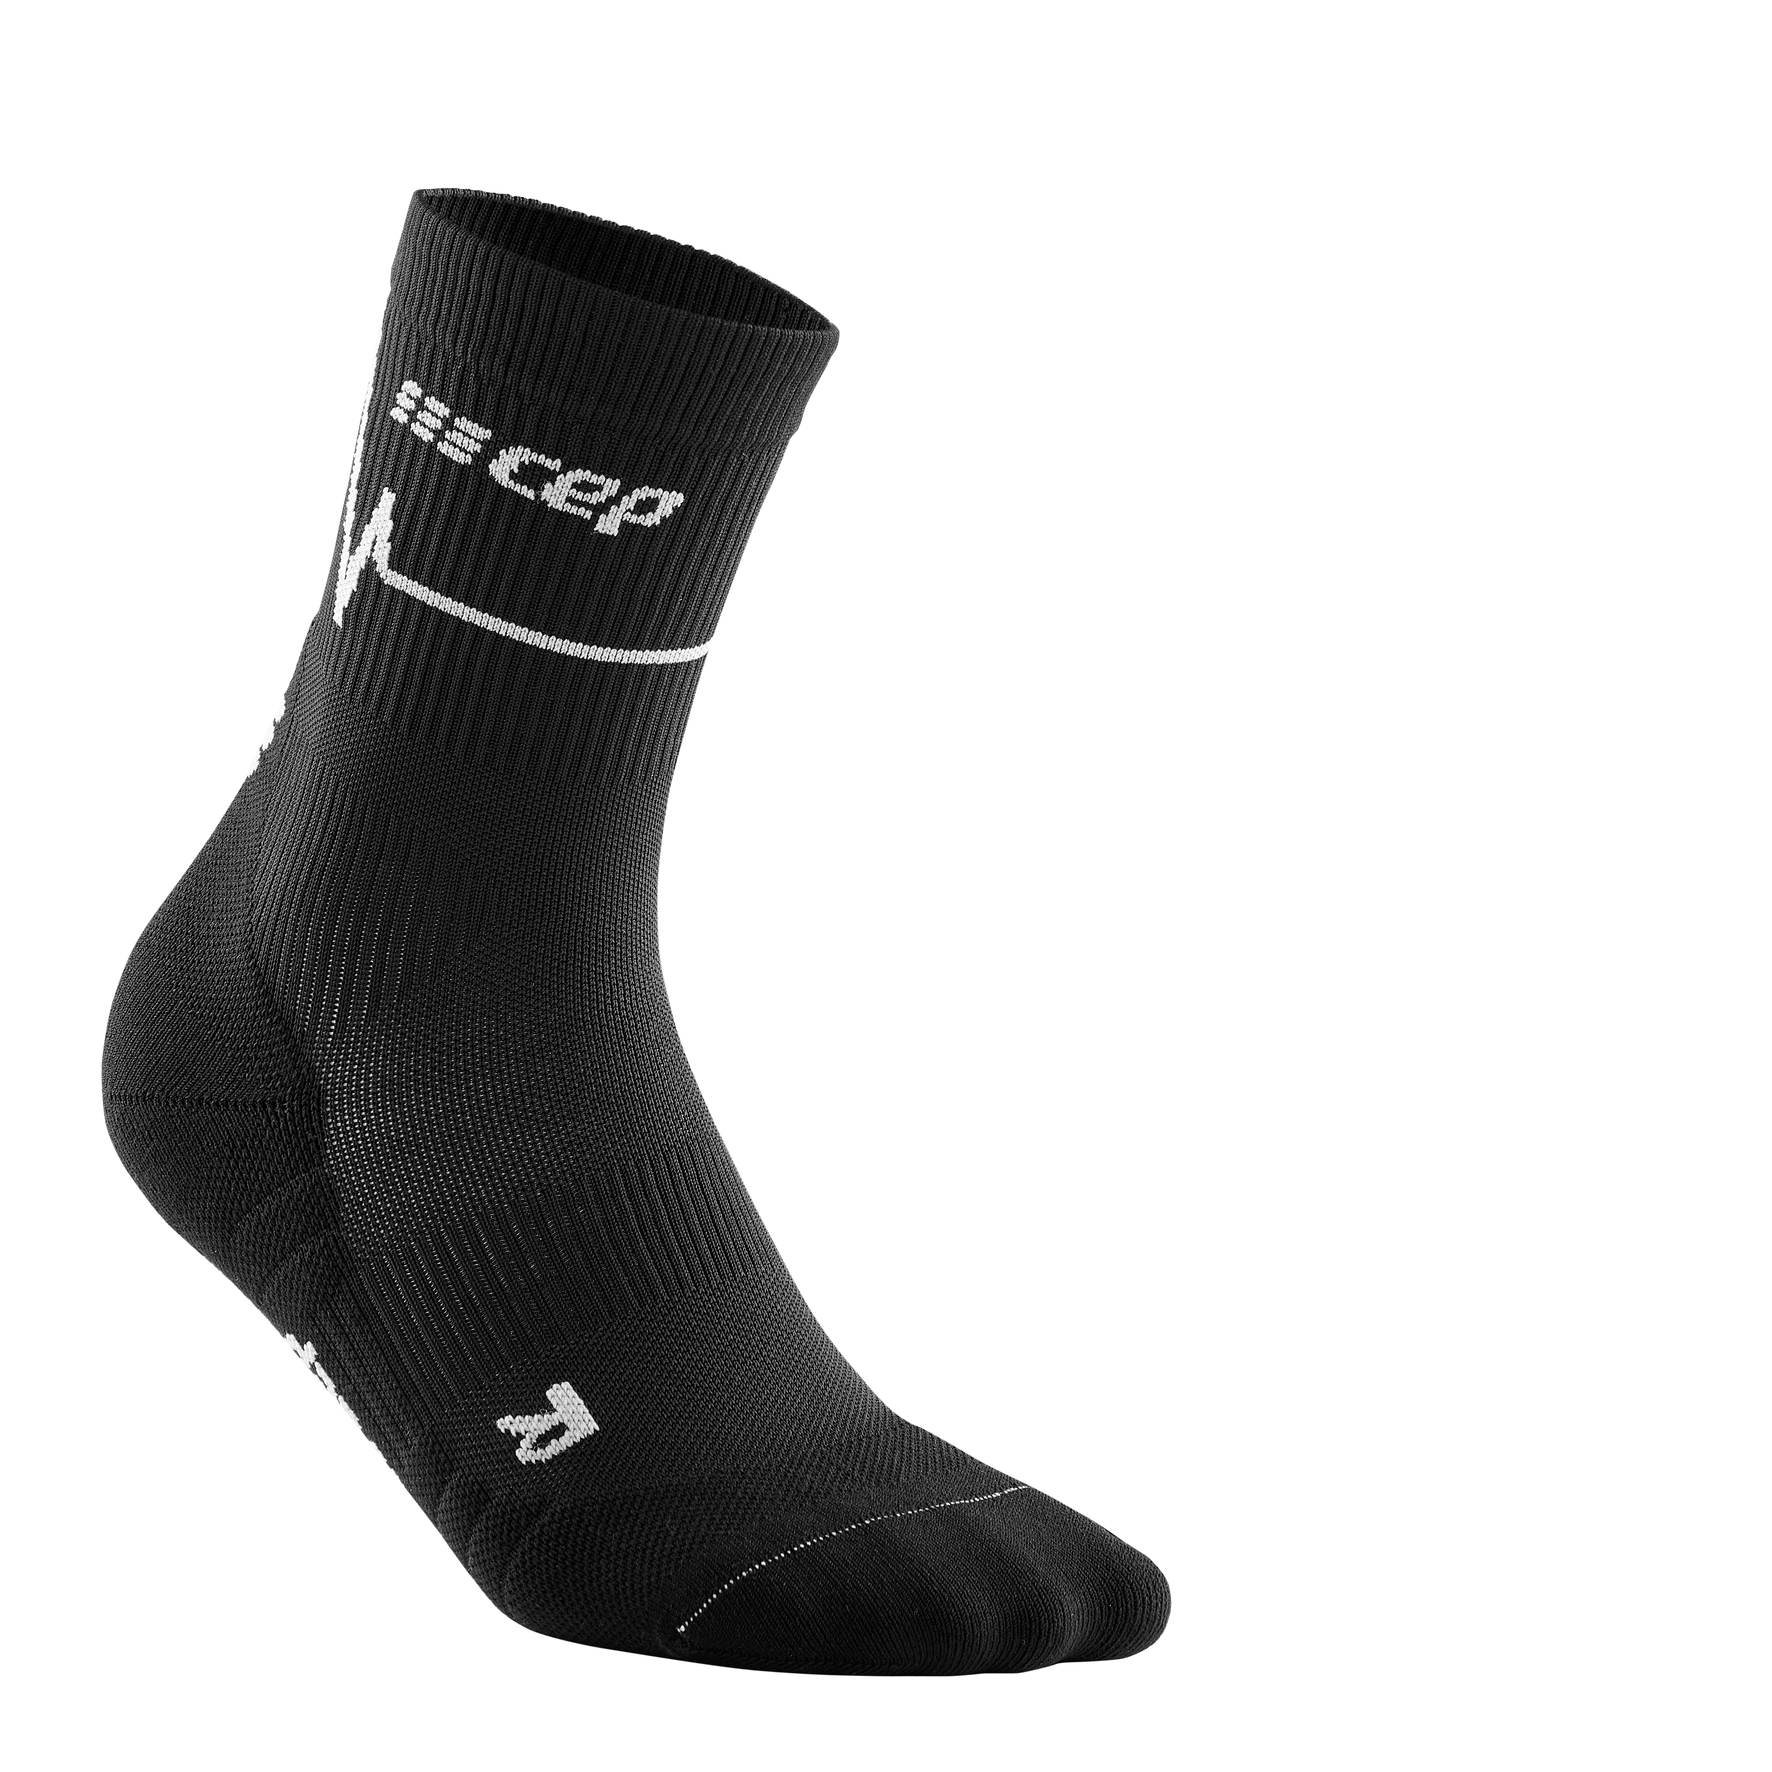 CEP heartbeat mid-cut socks, dark c